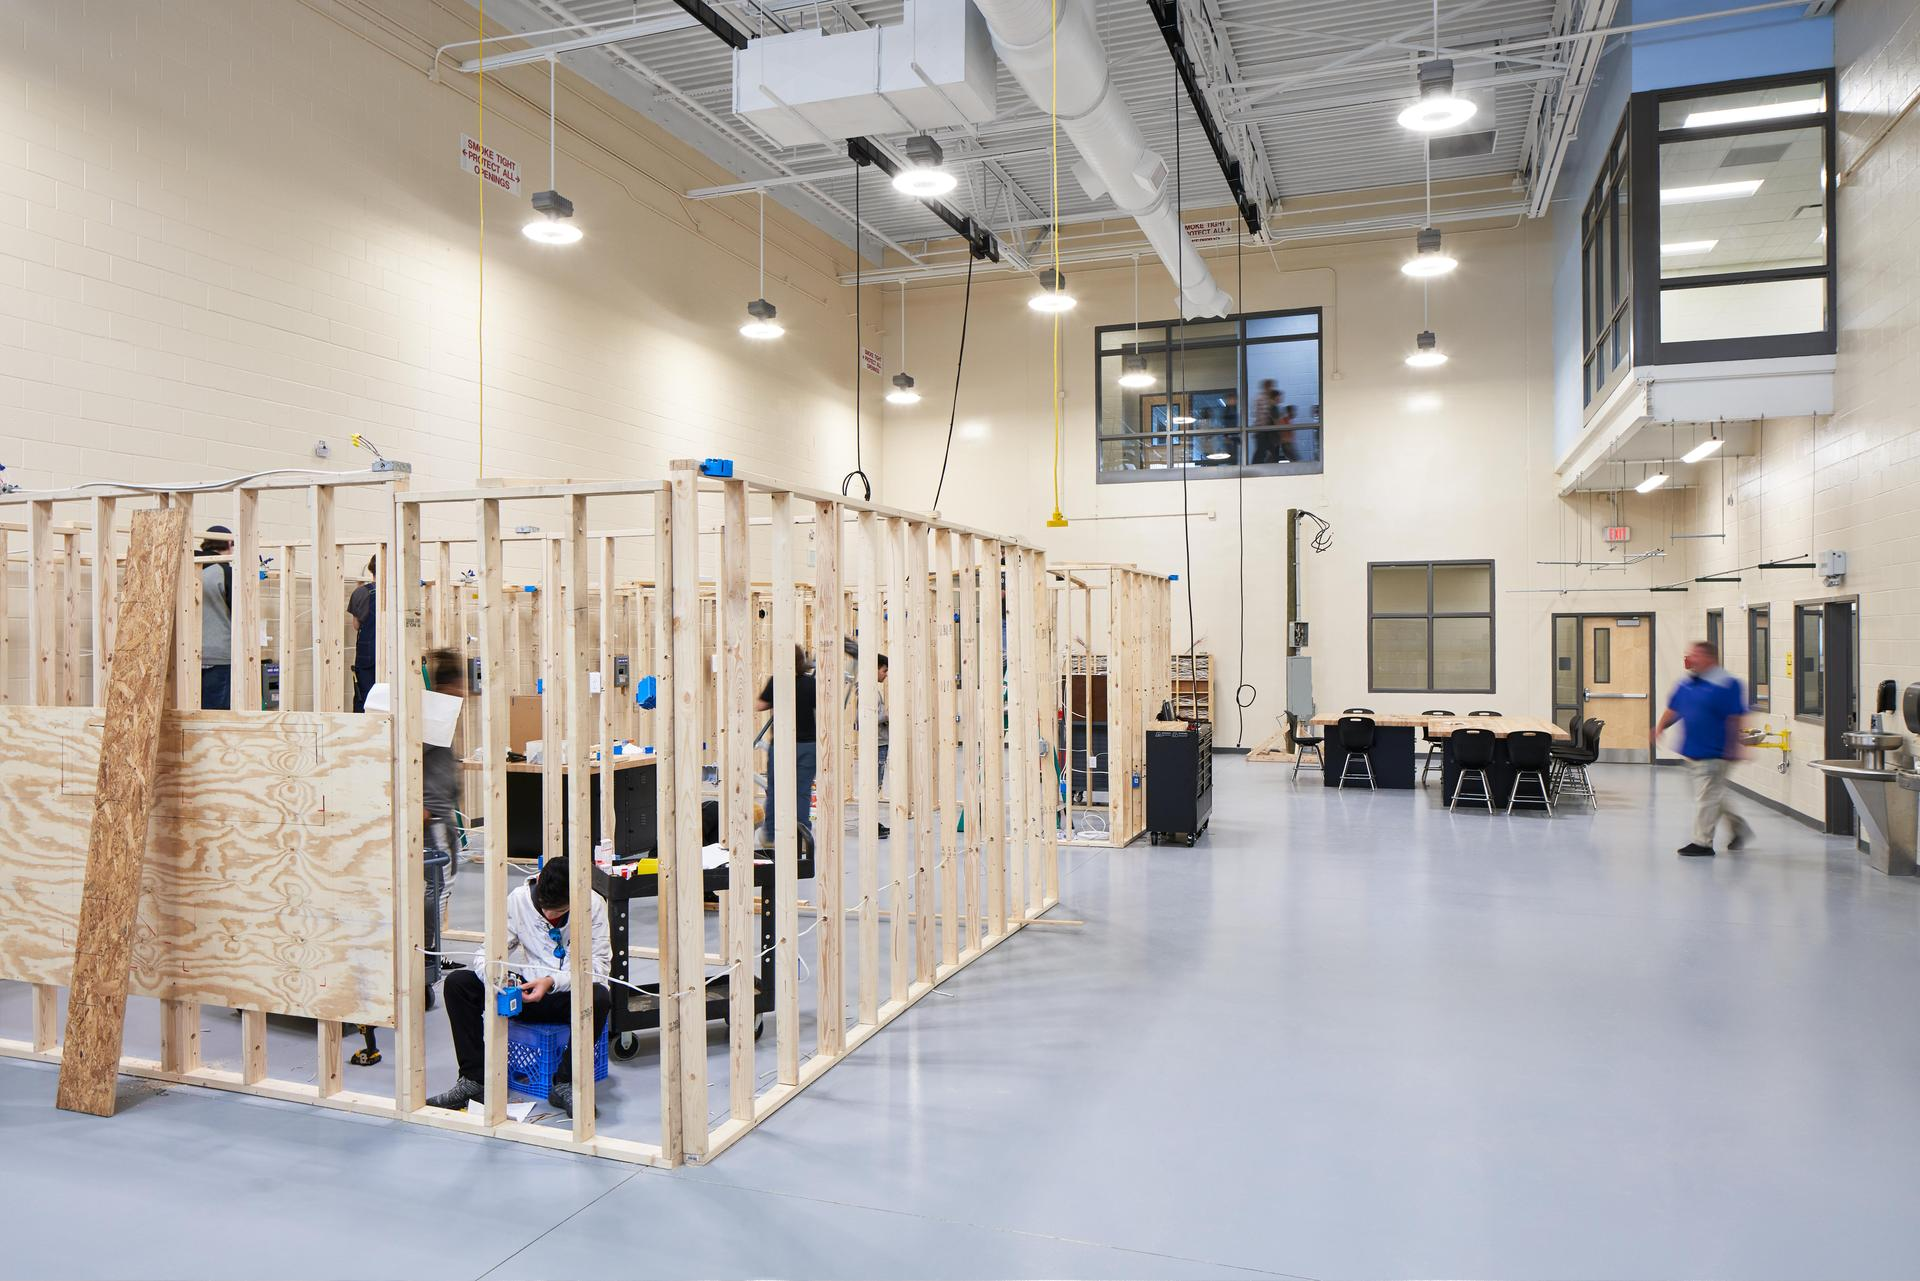 Lexington 2 Innovation Center Electricity Classroom